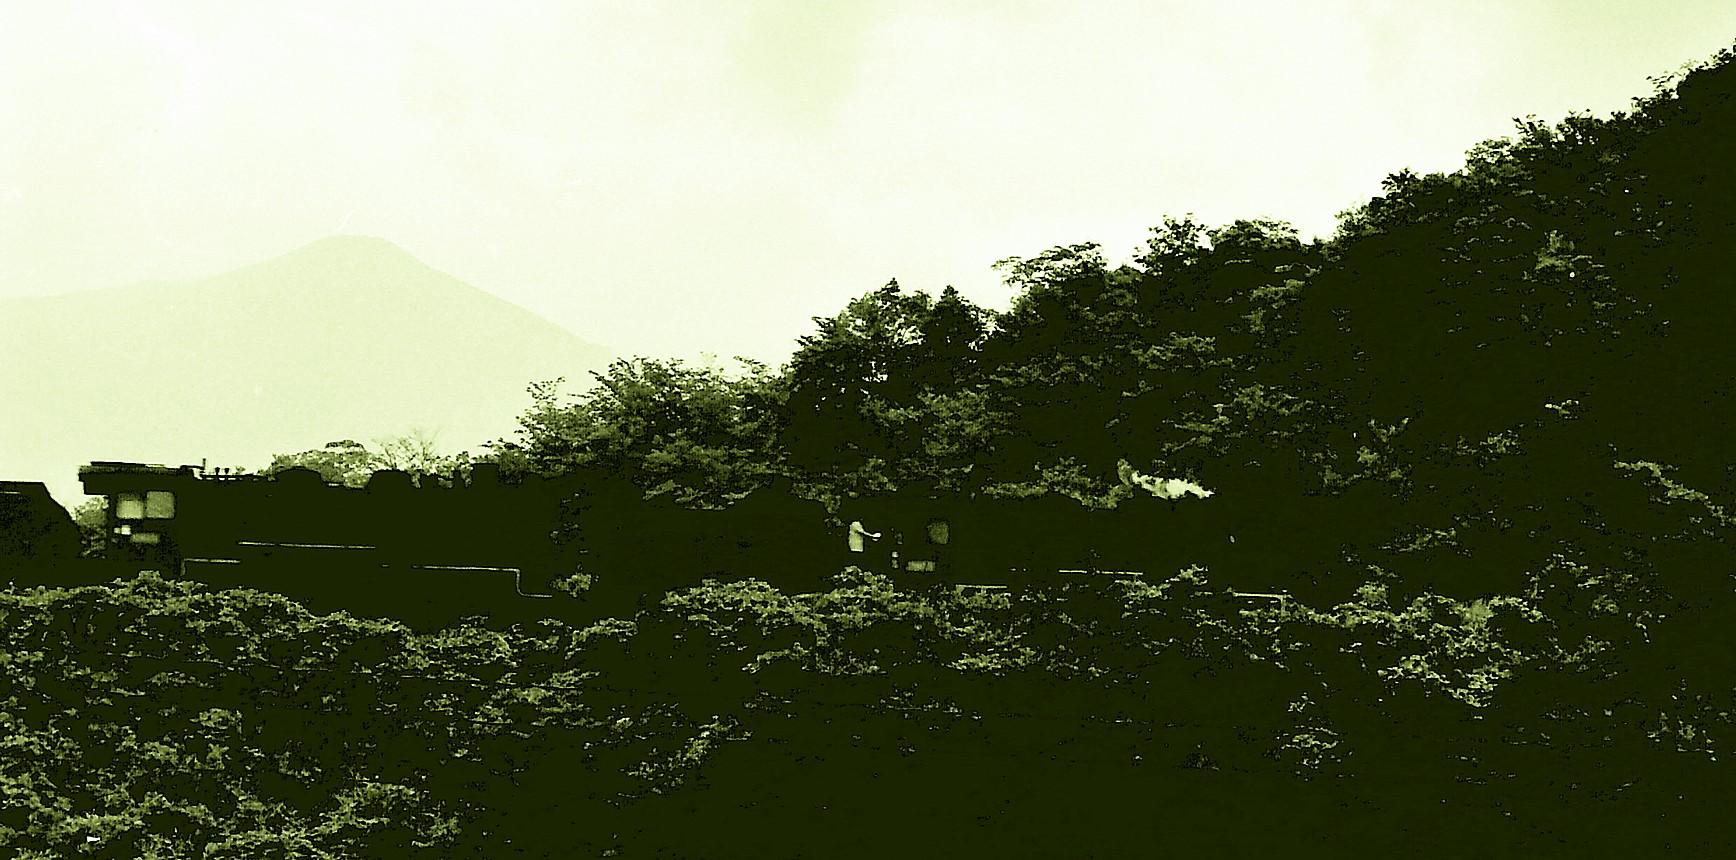 PICT0932x.jpg